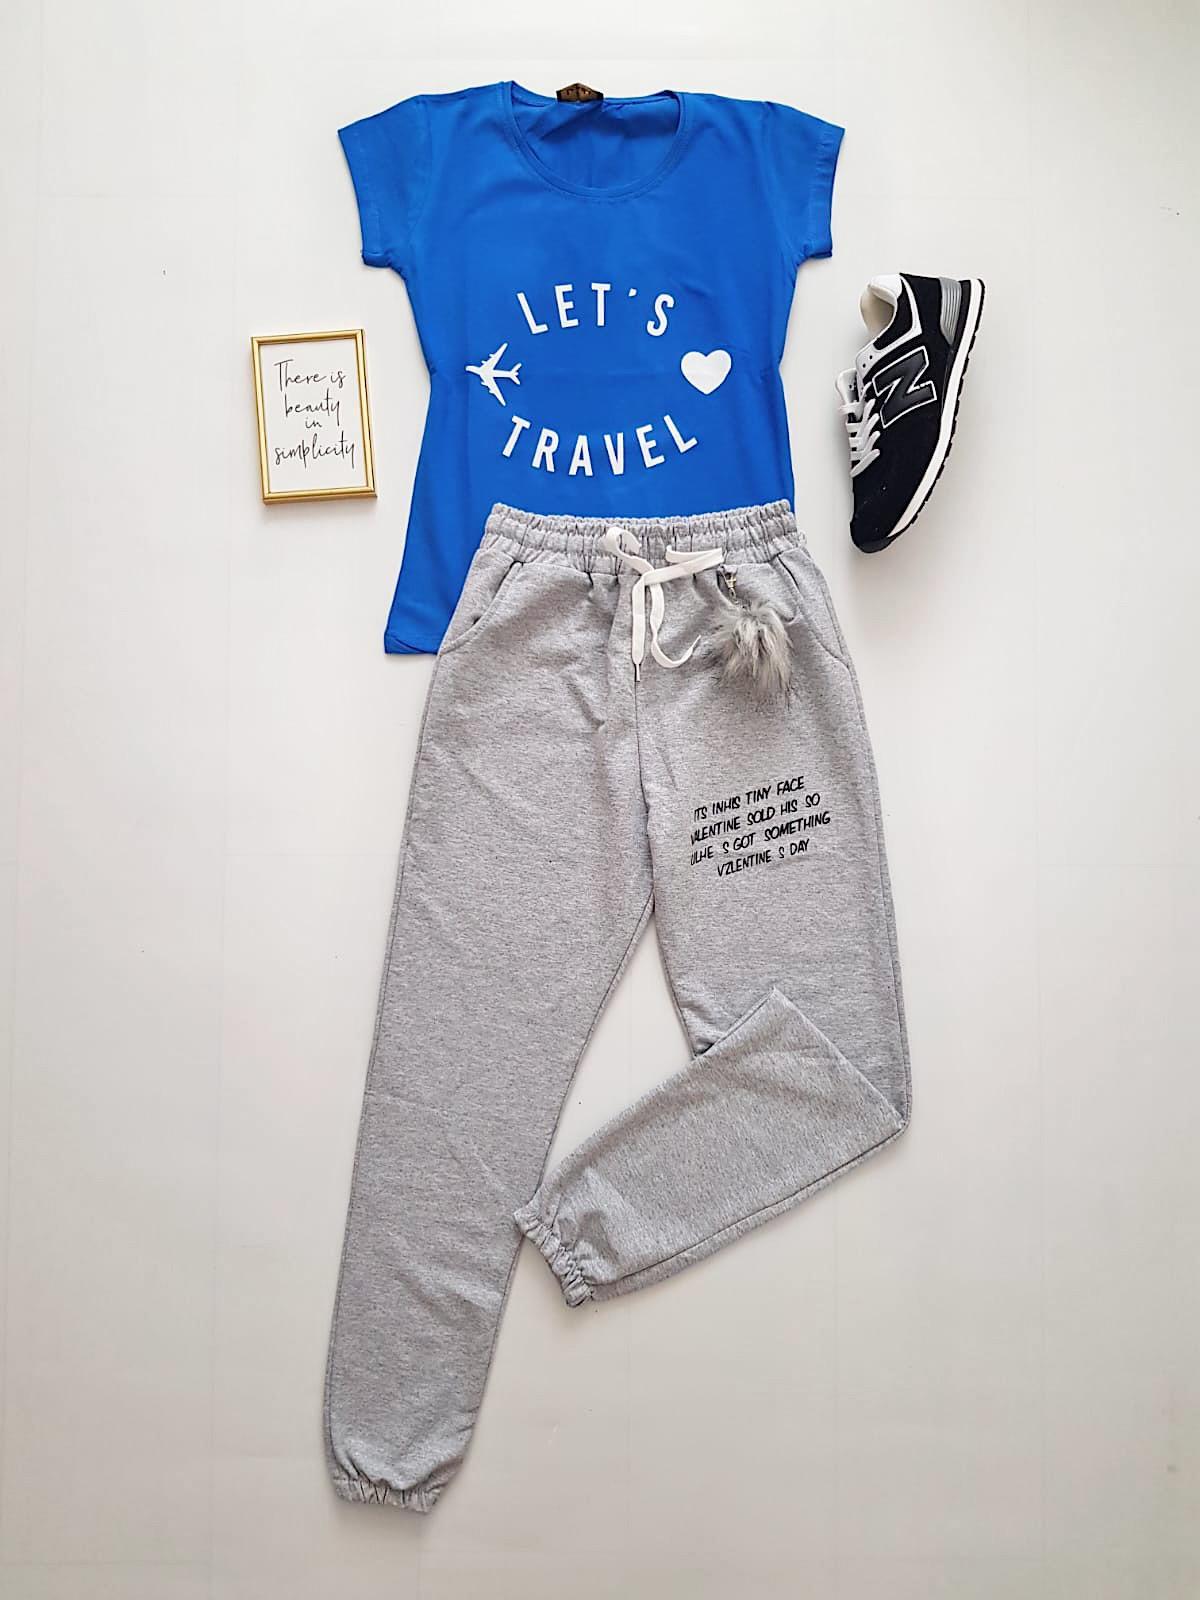 Compleu dama casual COMBO din pantaloni lungi gri puf + tricou albastru Travel